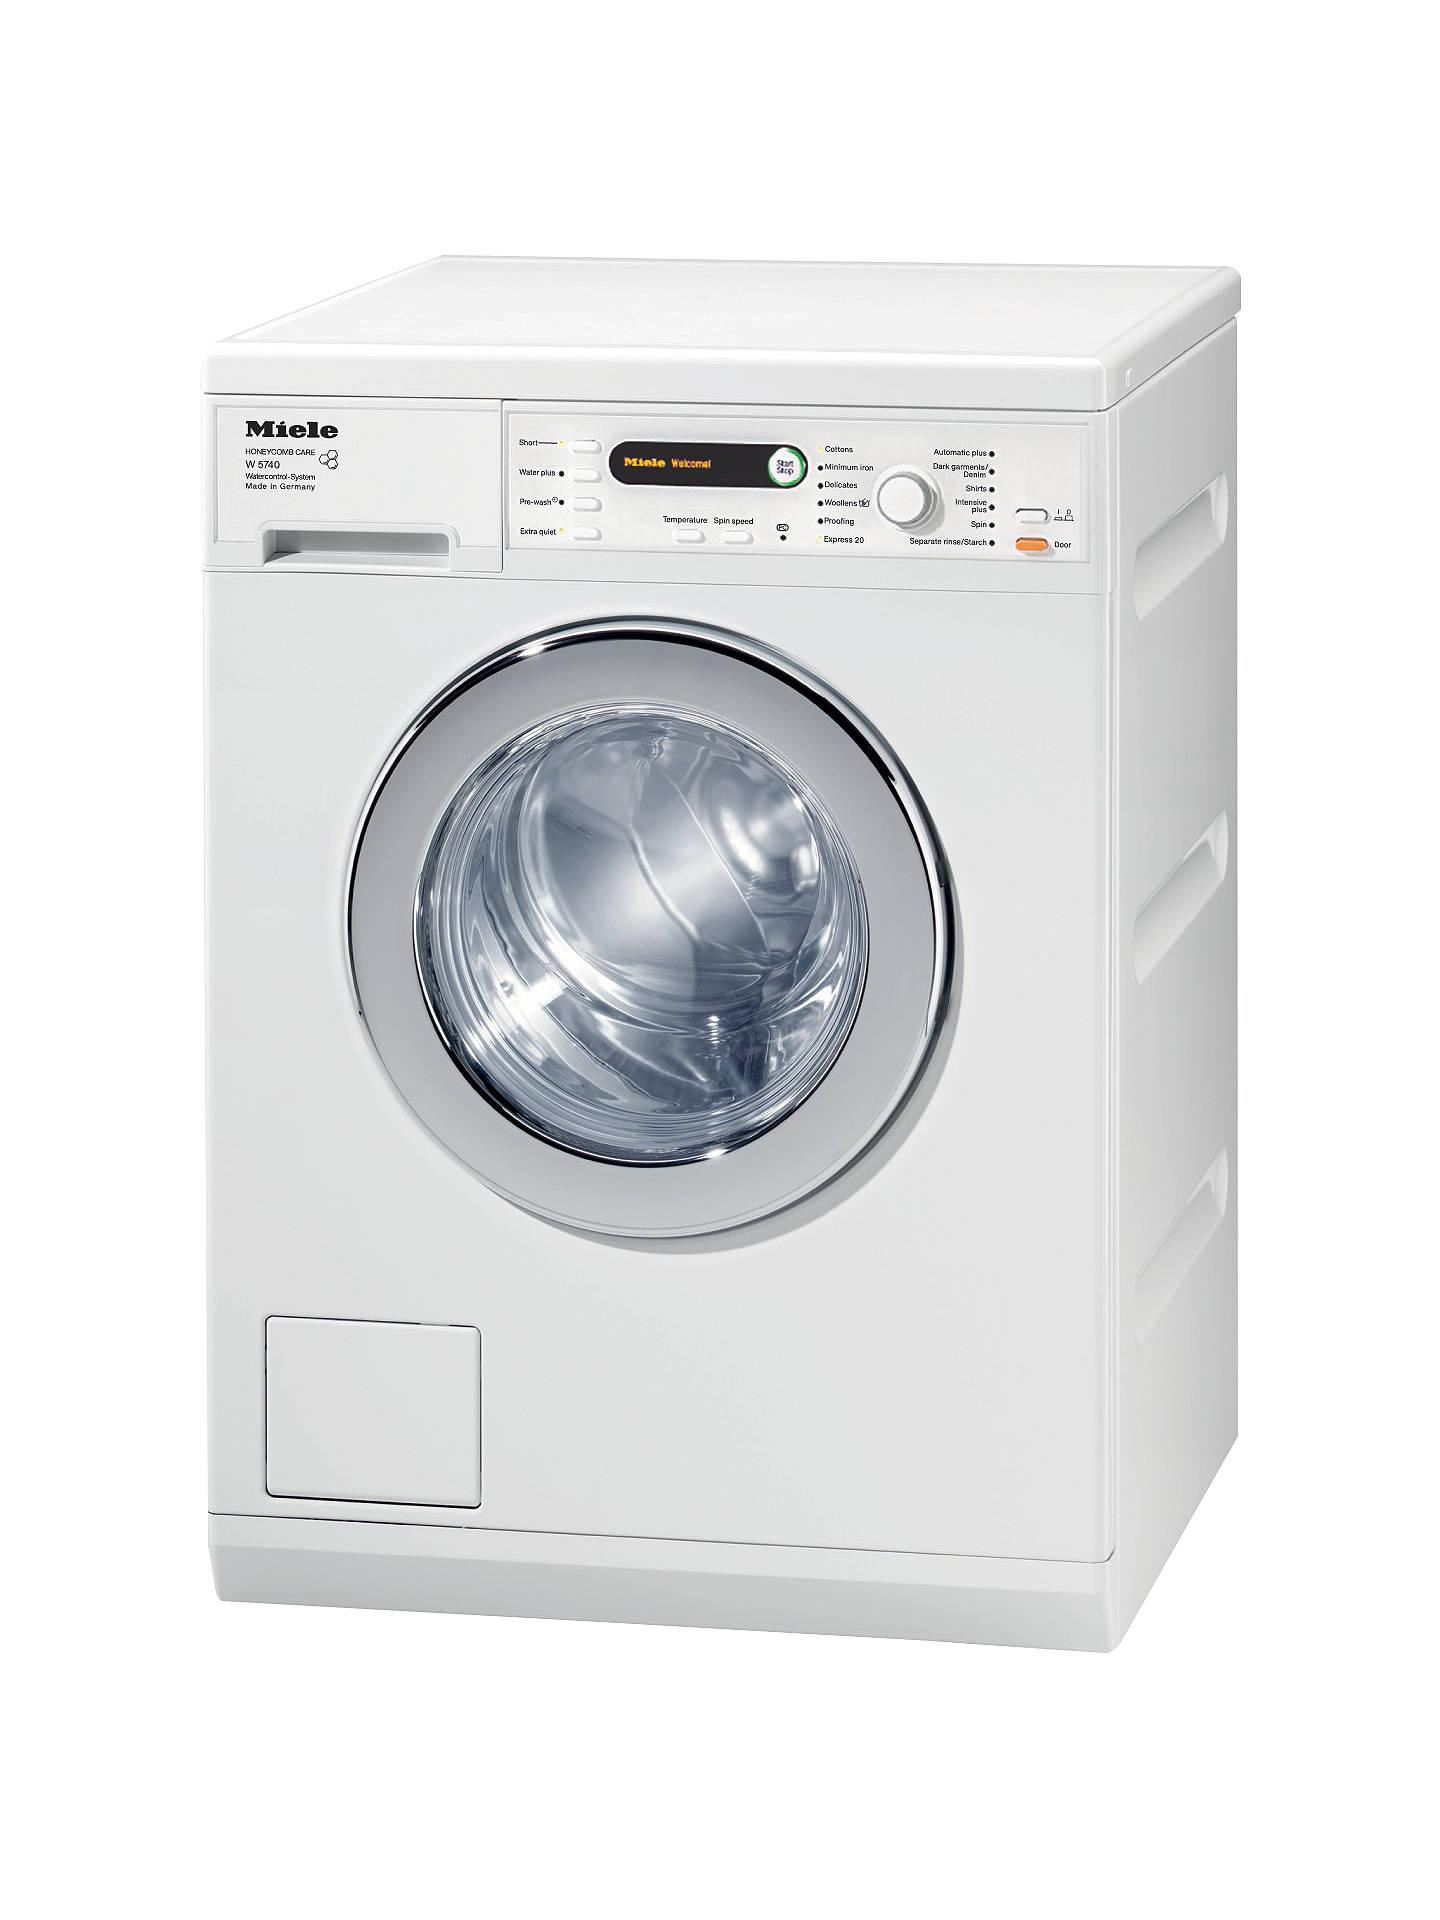 Miele W5740 Washing Machine, 7kg Load, A+++ Energy Rating ...